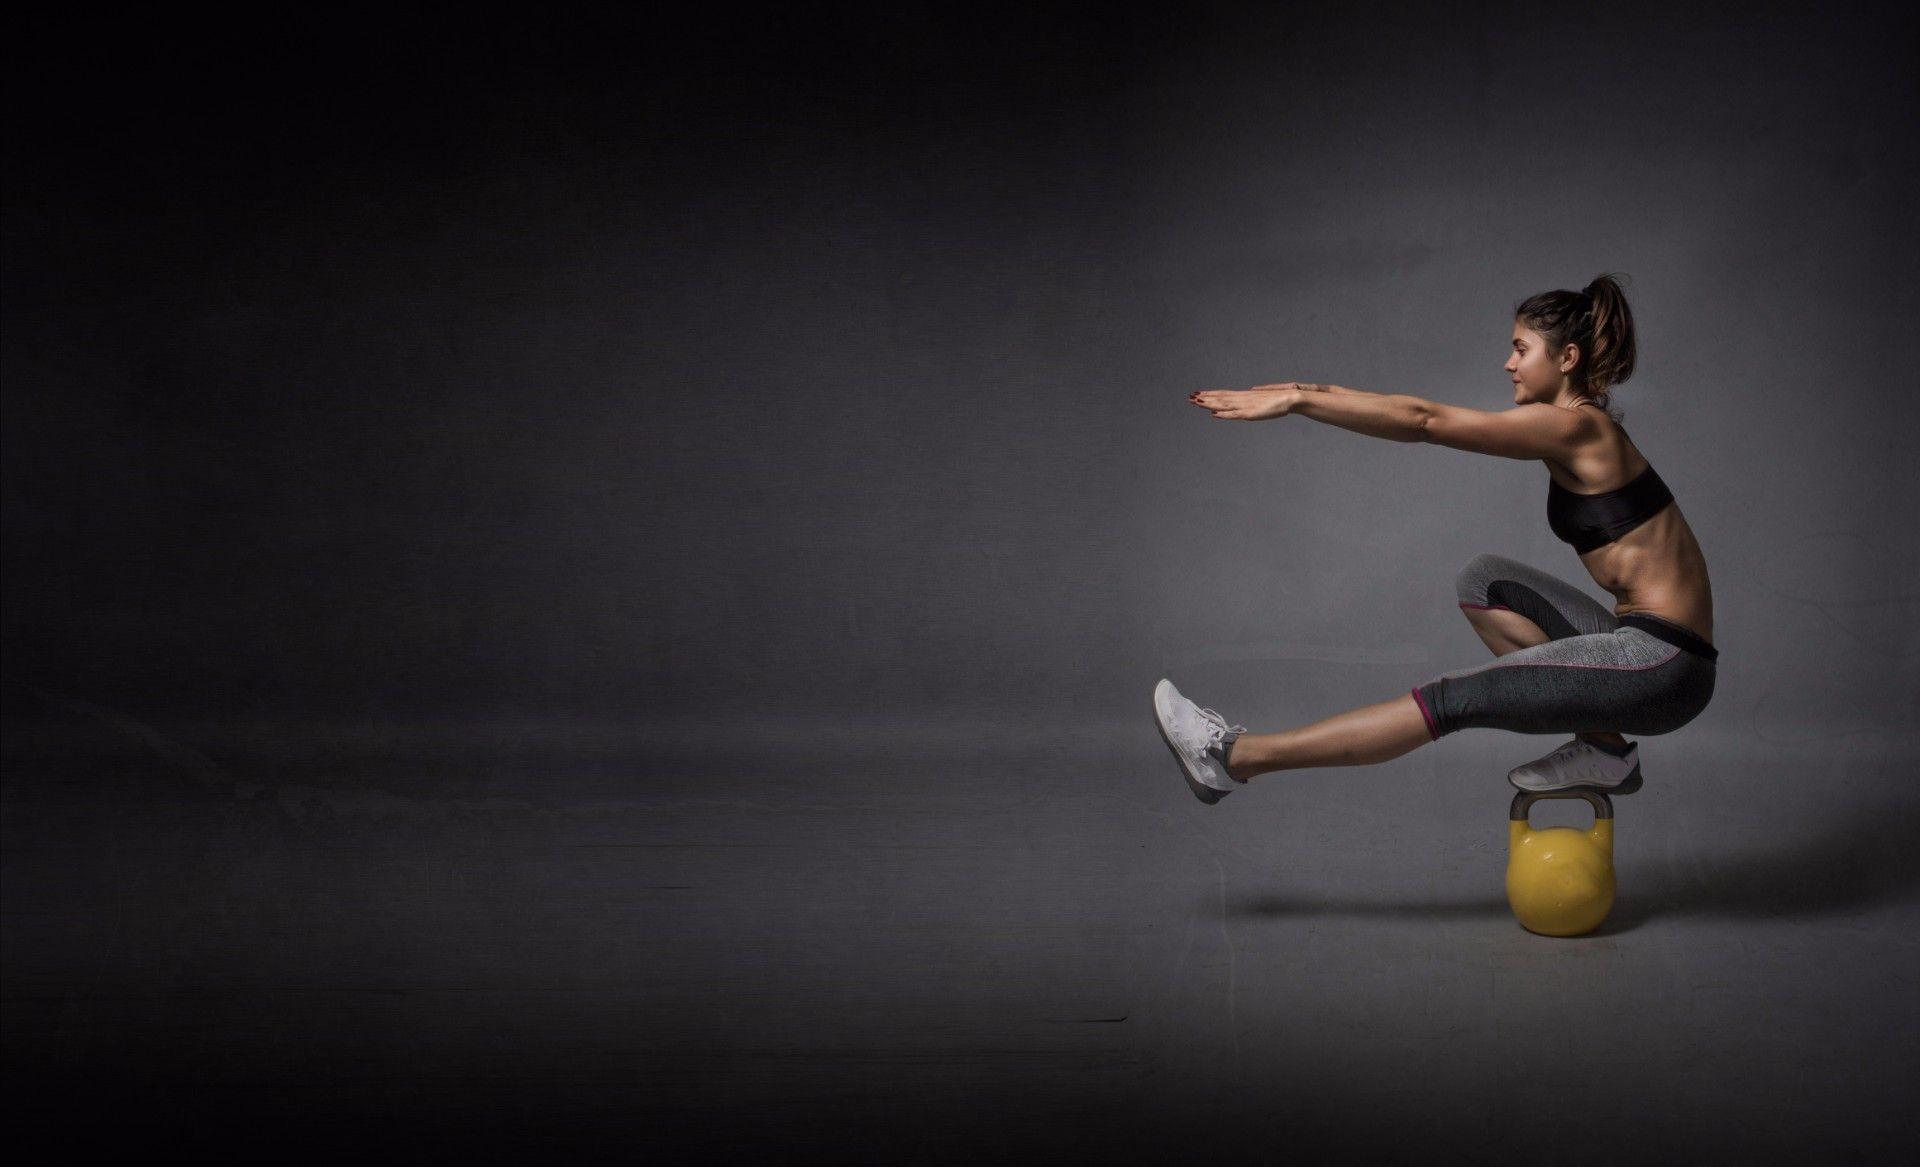 Squat Warmup Routine Fun workouts, Kettlebell, Workout